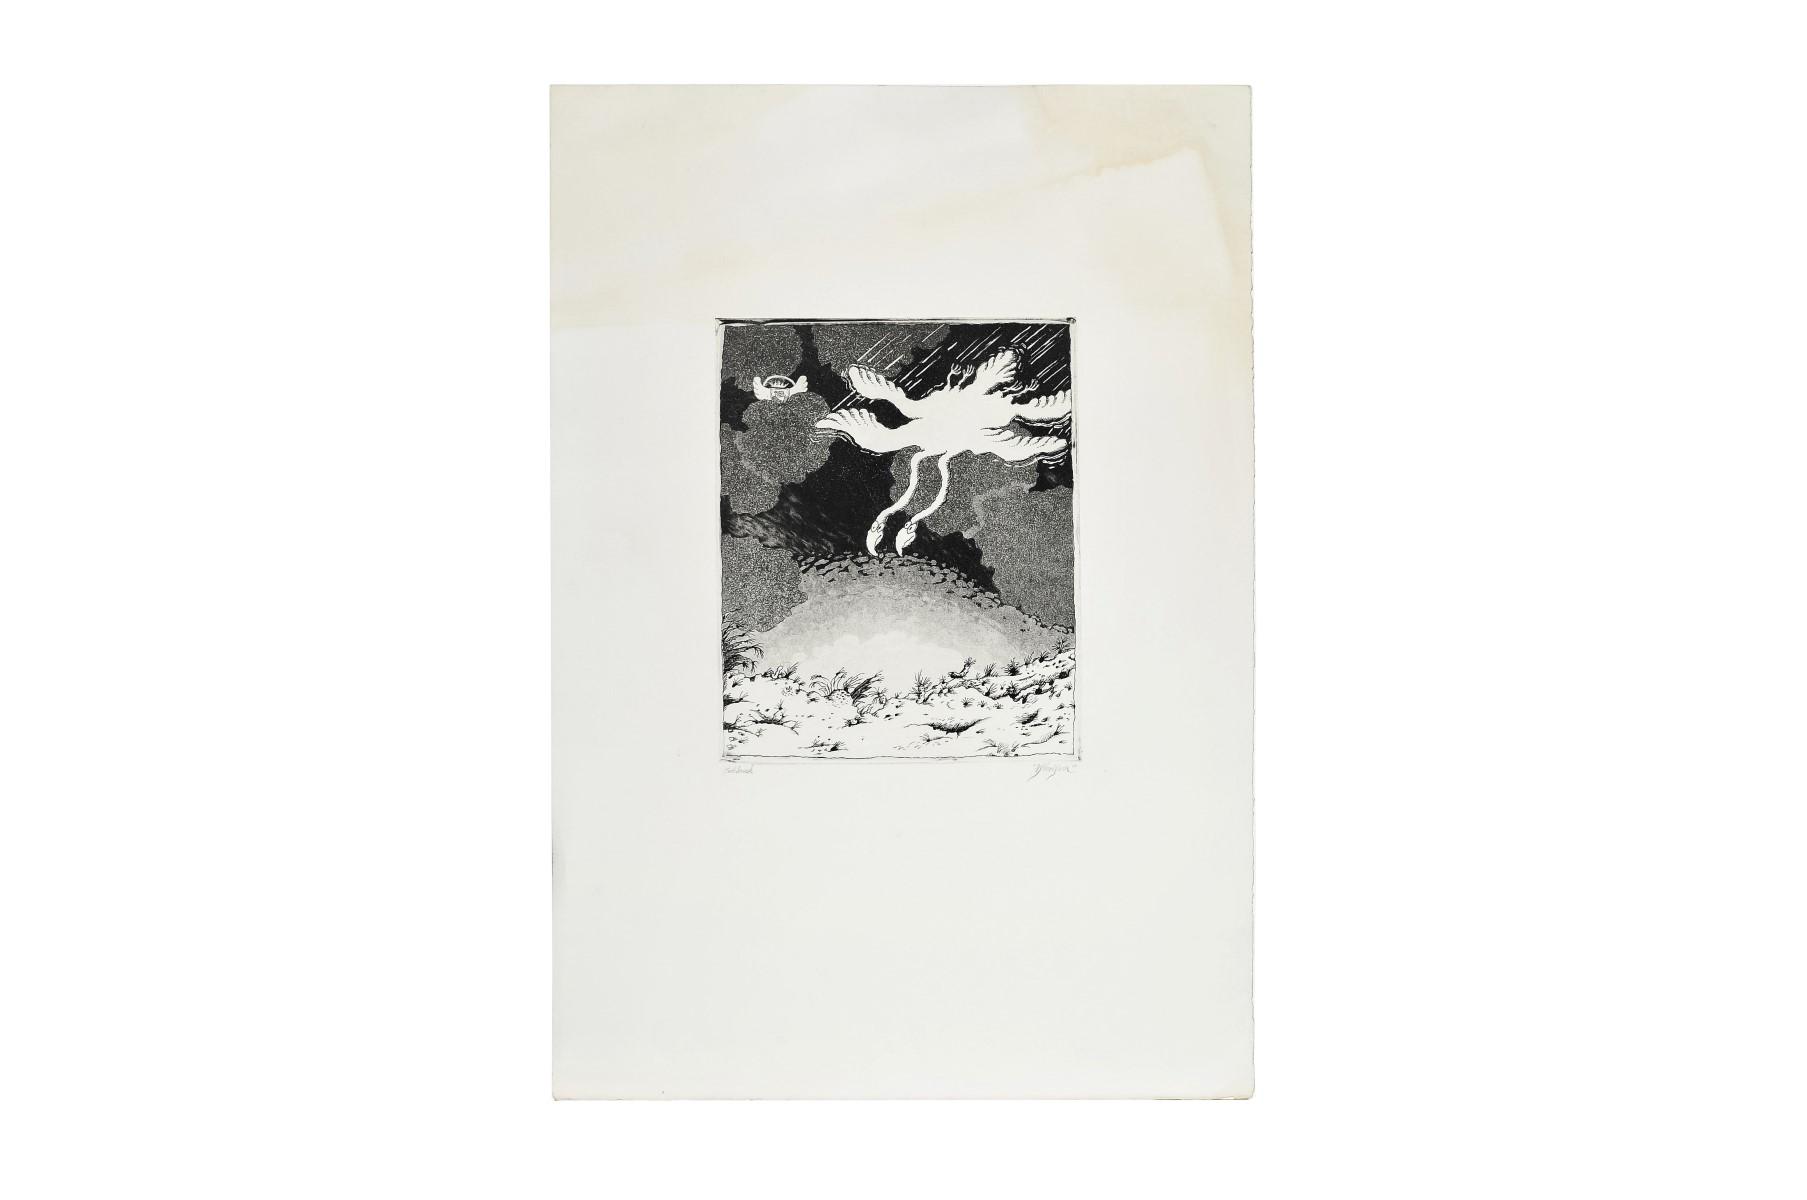 #19 Walter Schmöger (1943), Sample Print | Walter Schmögner* (1943), Probedruck Image